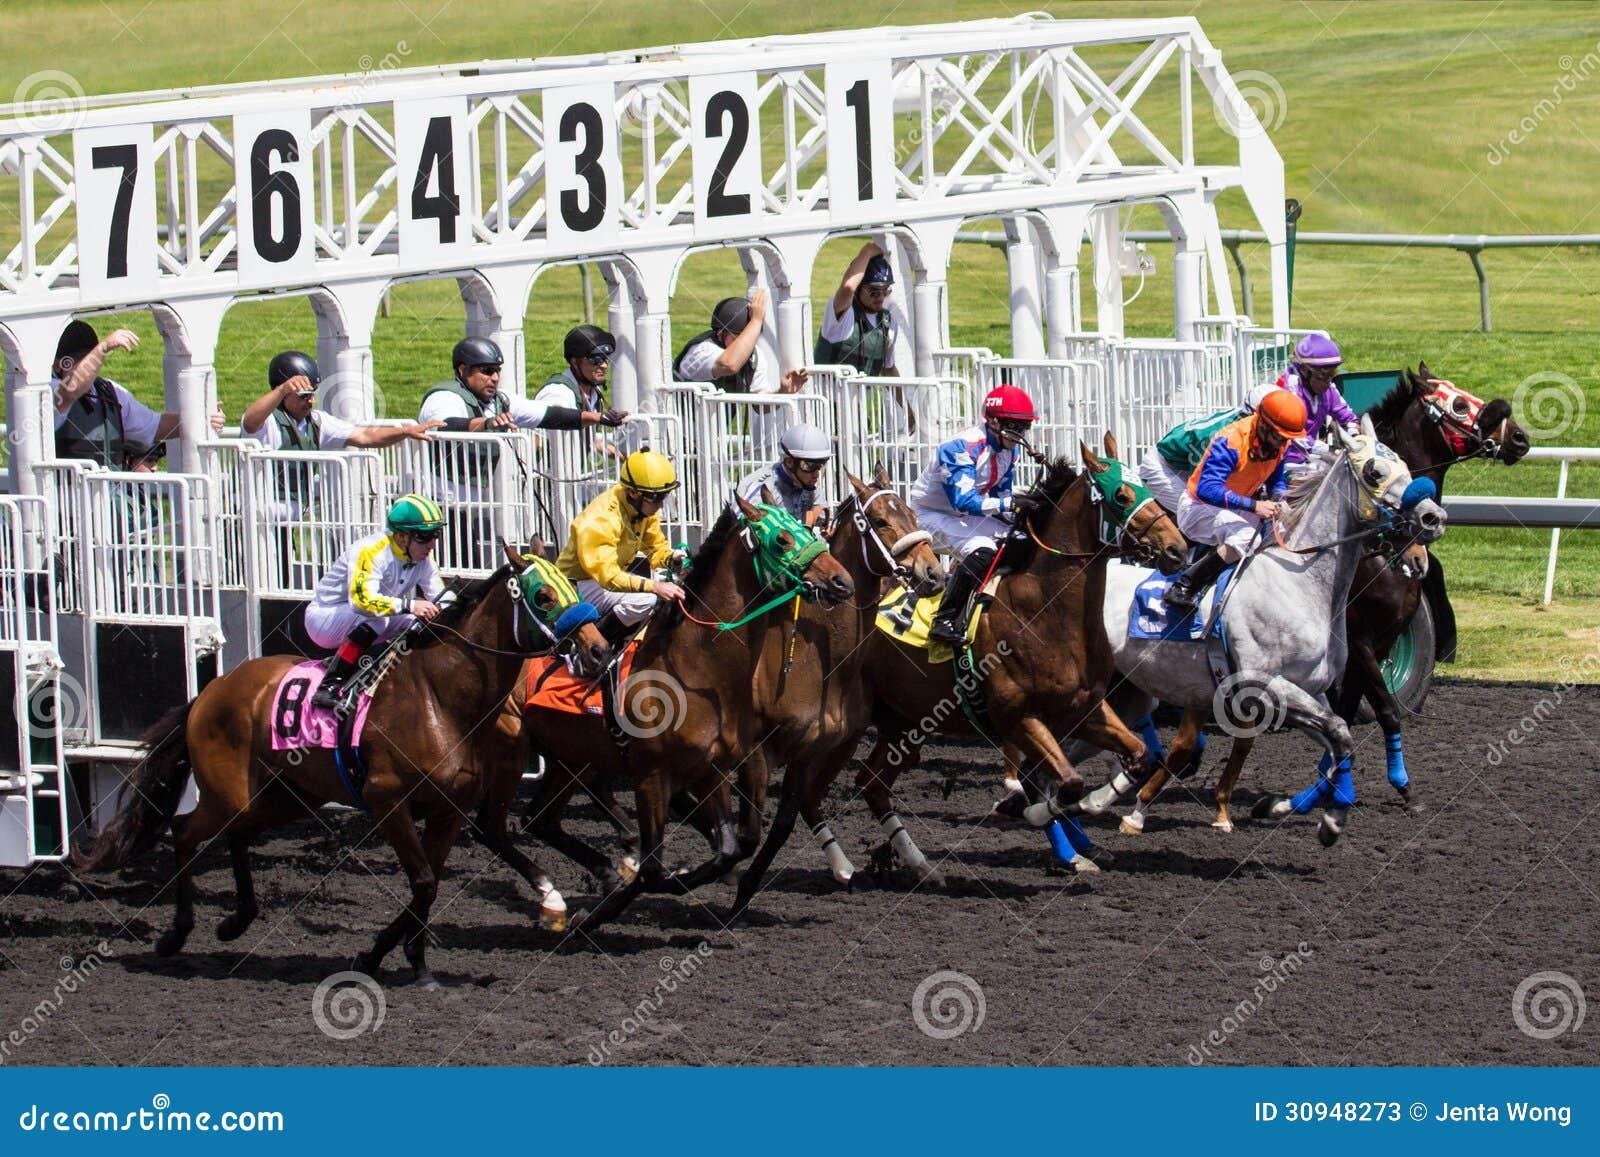 horse racing gates